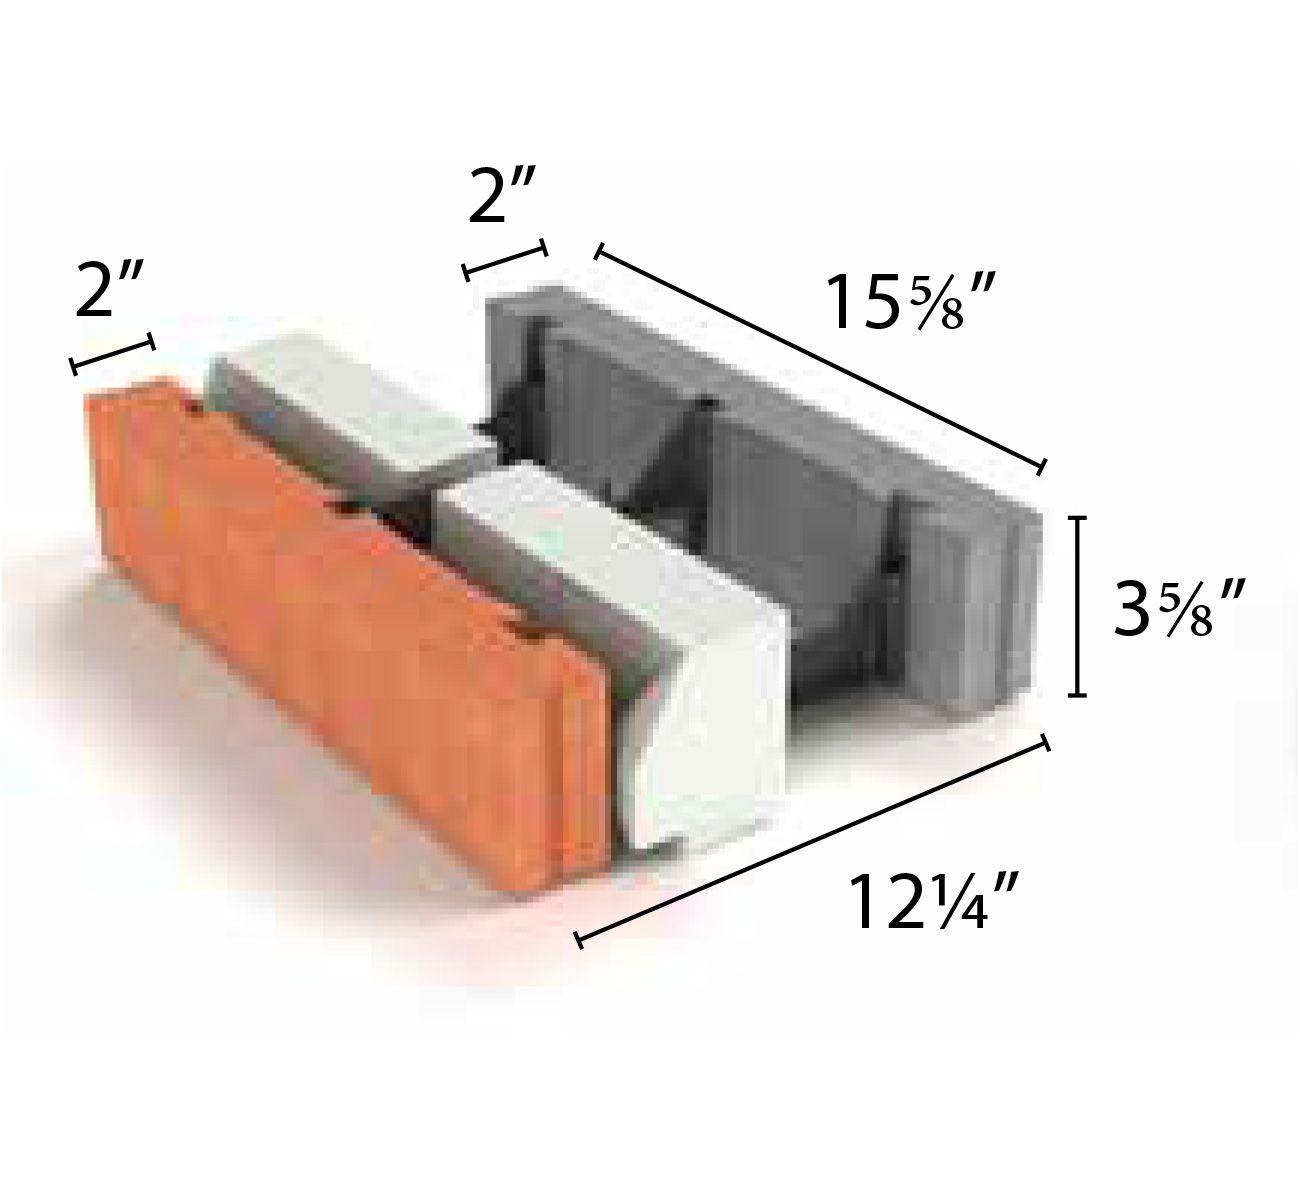 12 Half Height Building Systems Masonry Wall Concrete Masonry Unit